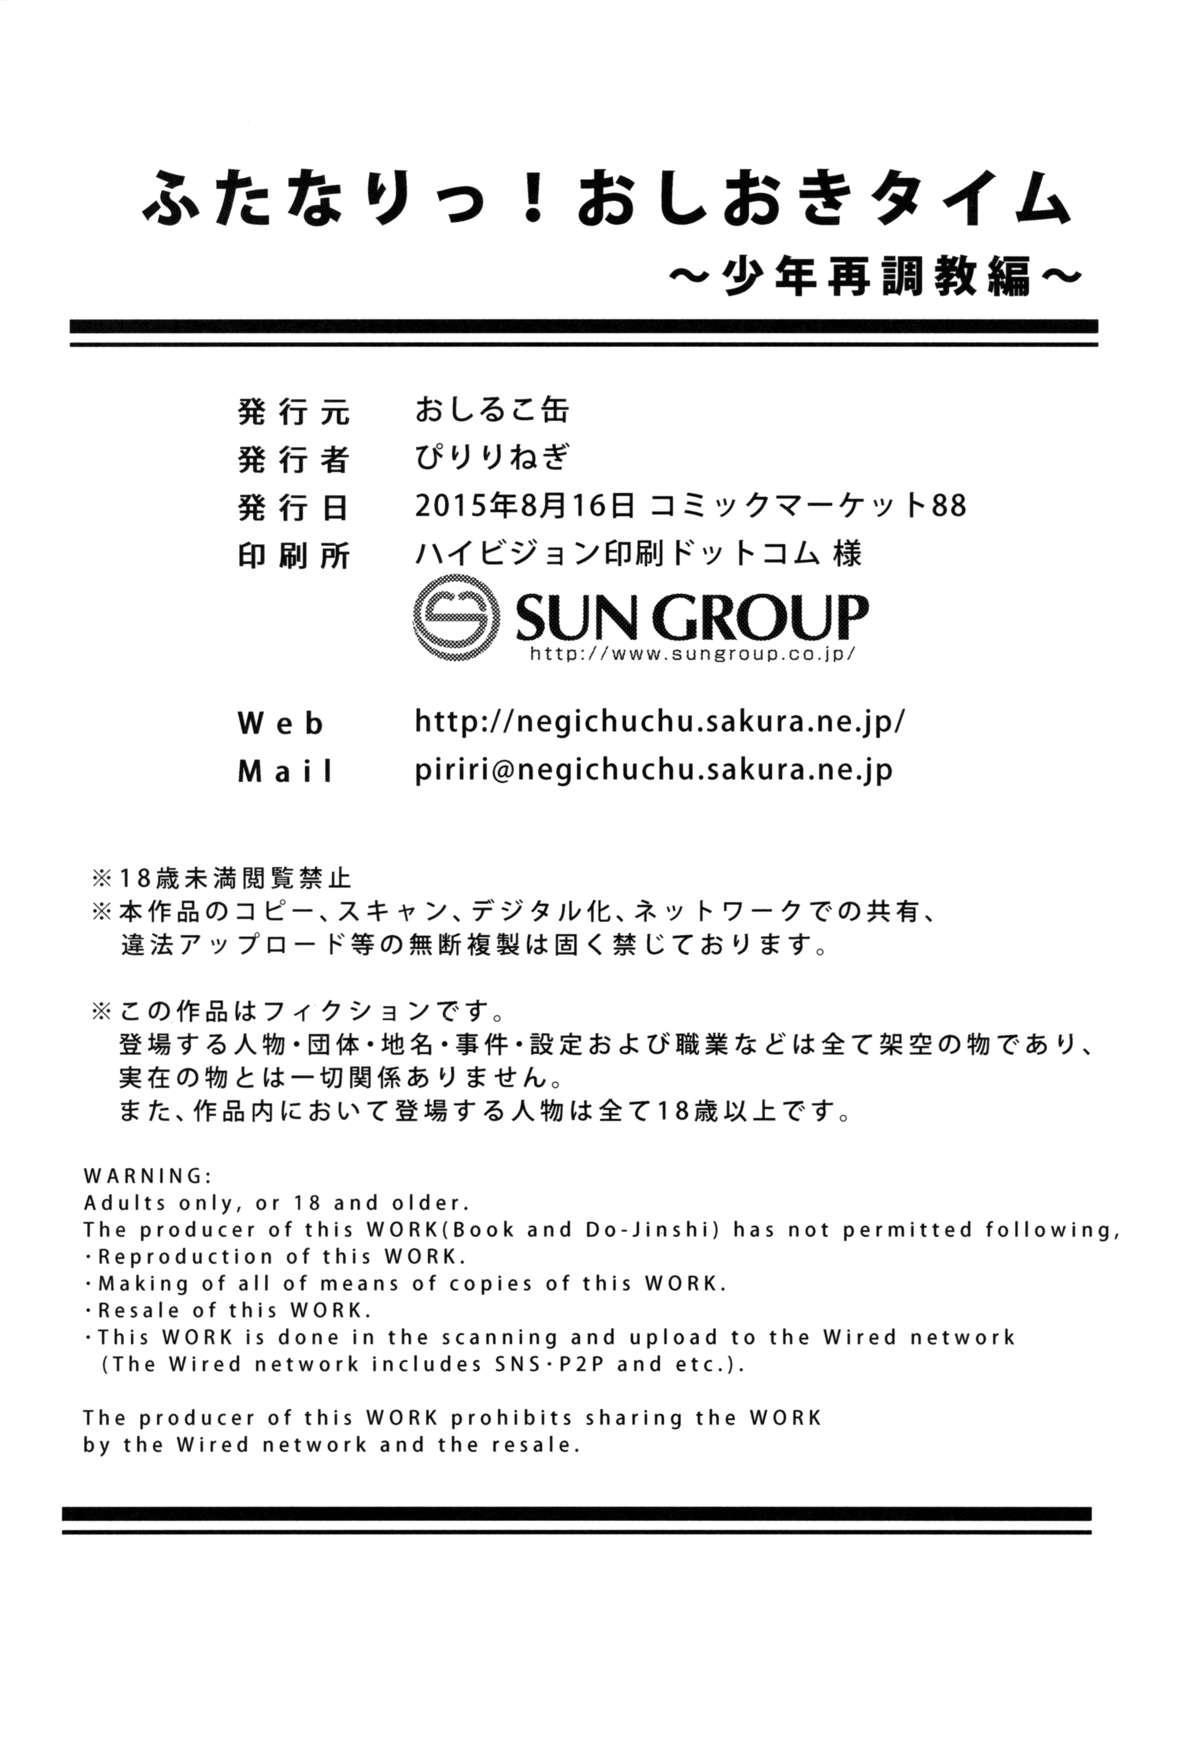 (C88) [Oshiruko Kan (Piririnegi)] Futanari! Oshioki Time 3 ~Shounen Saichoukyou Hen~   Futanari! Punishment Time 3 ~Boy's Retraining Chapter~ [English] =SW= 32